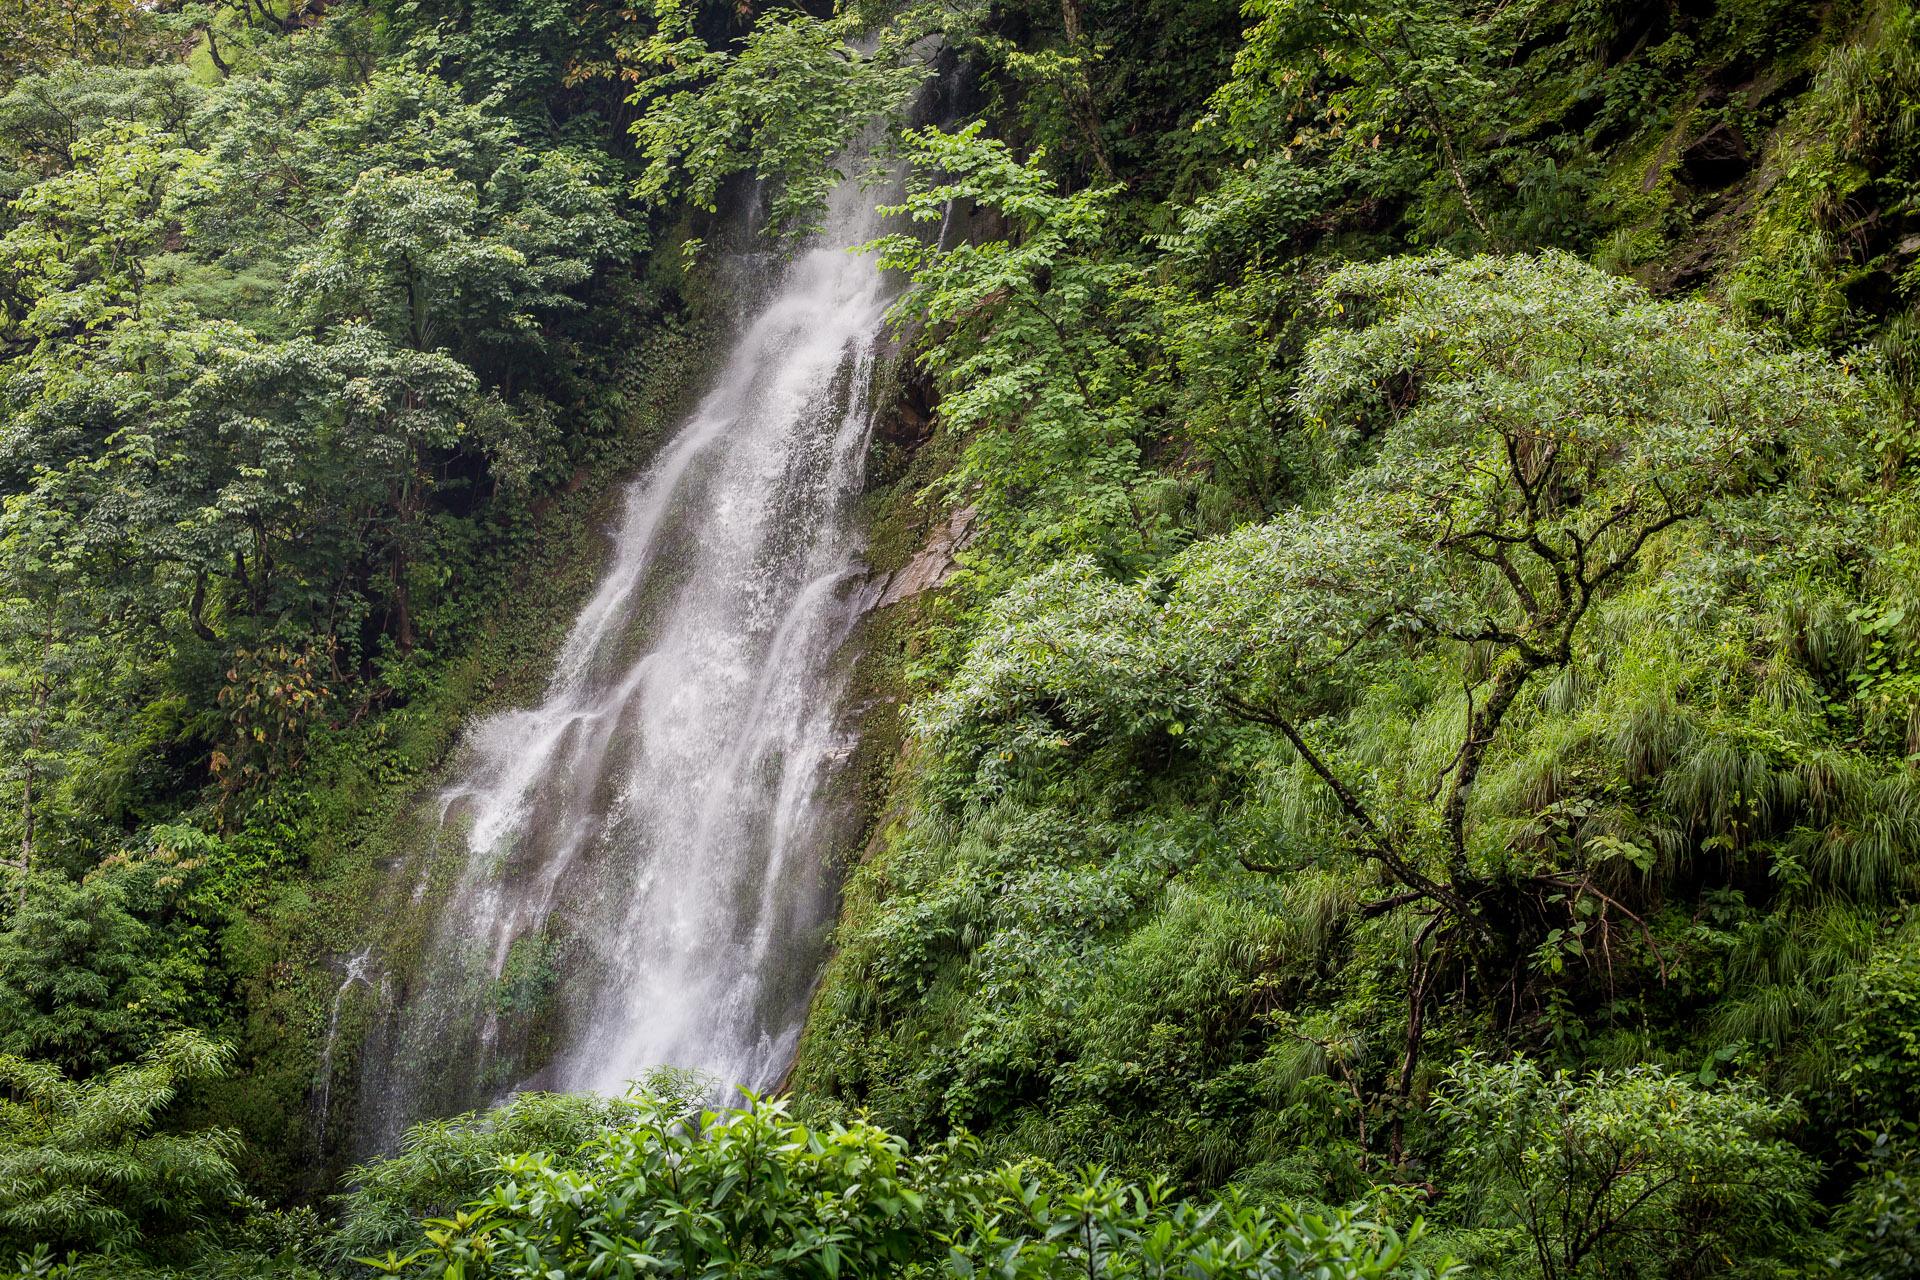 Waterfall on the way.